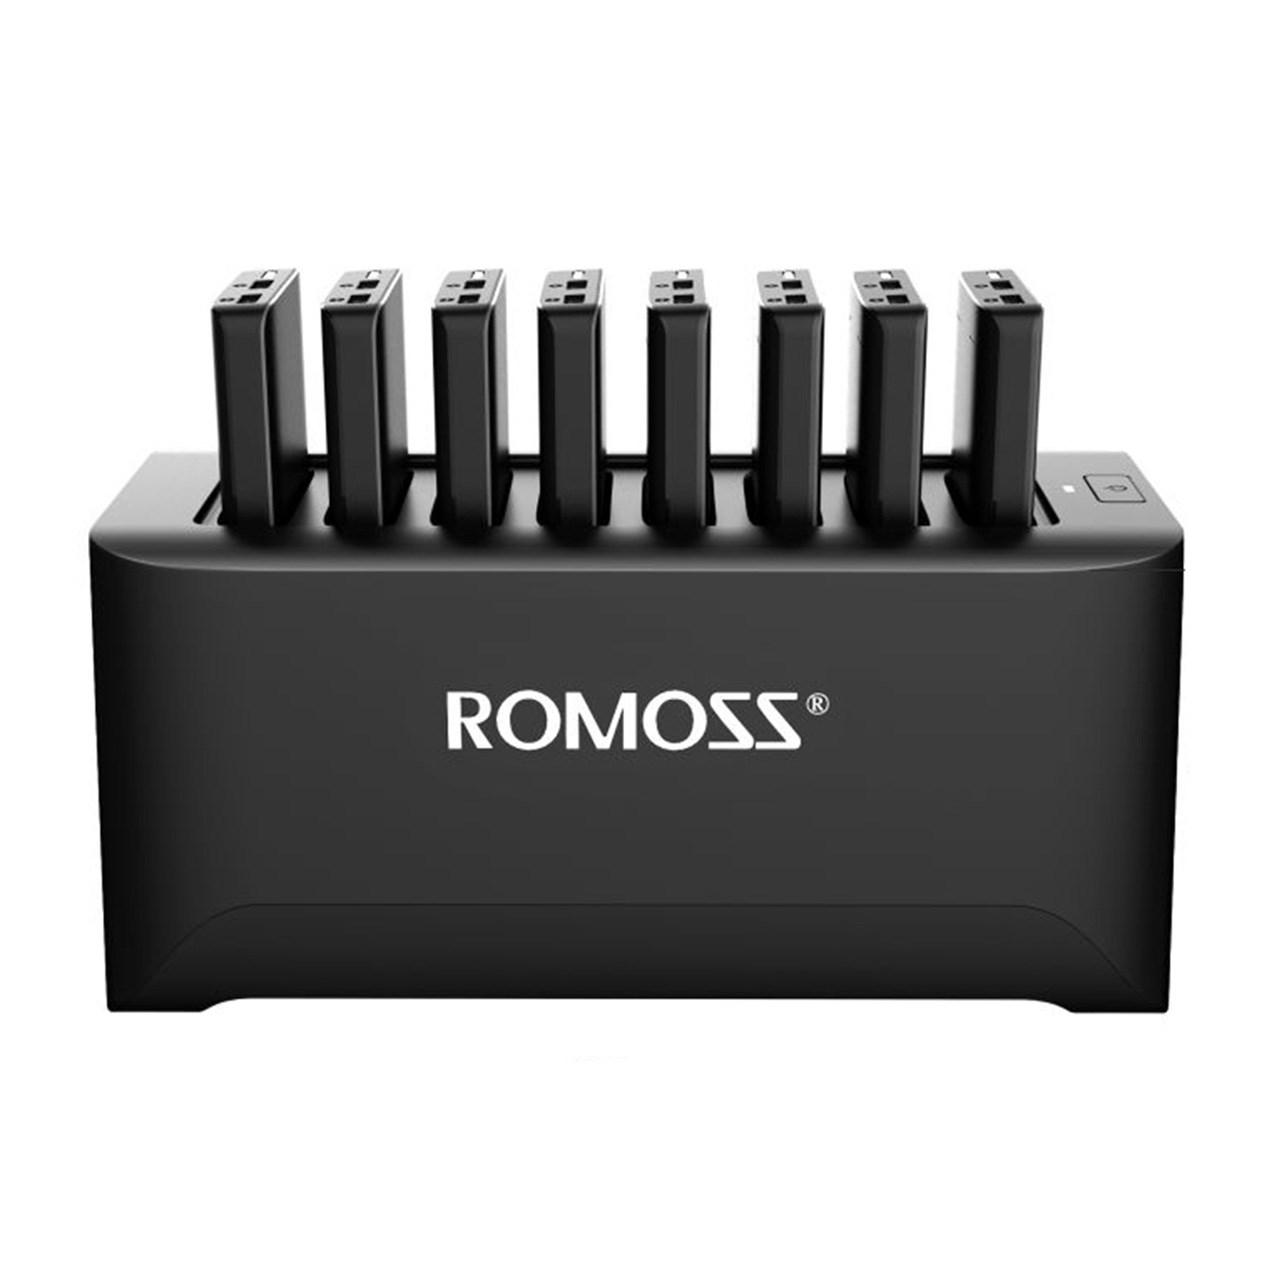 قیمت پایه شارژ قابل حمل روموس